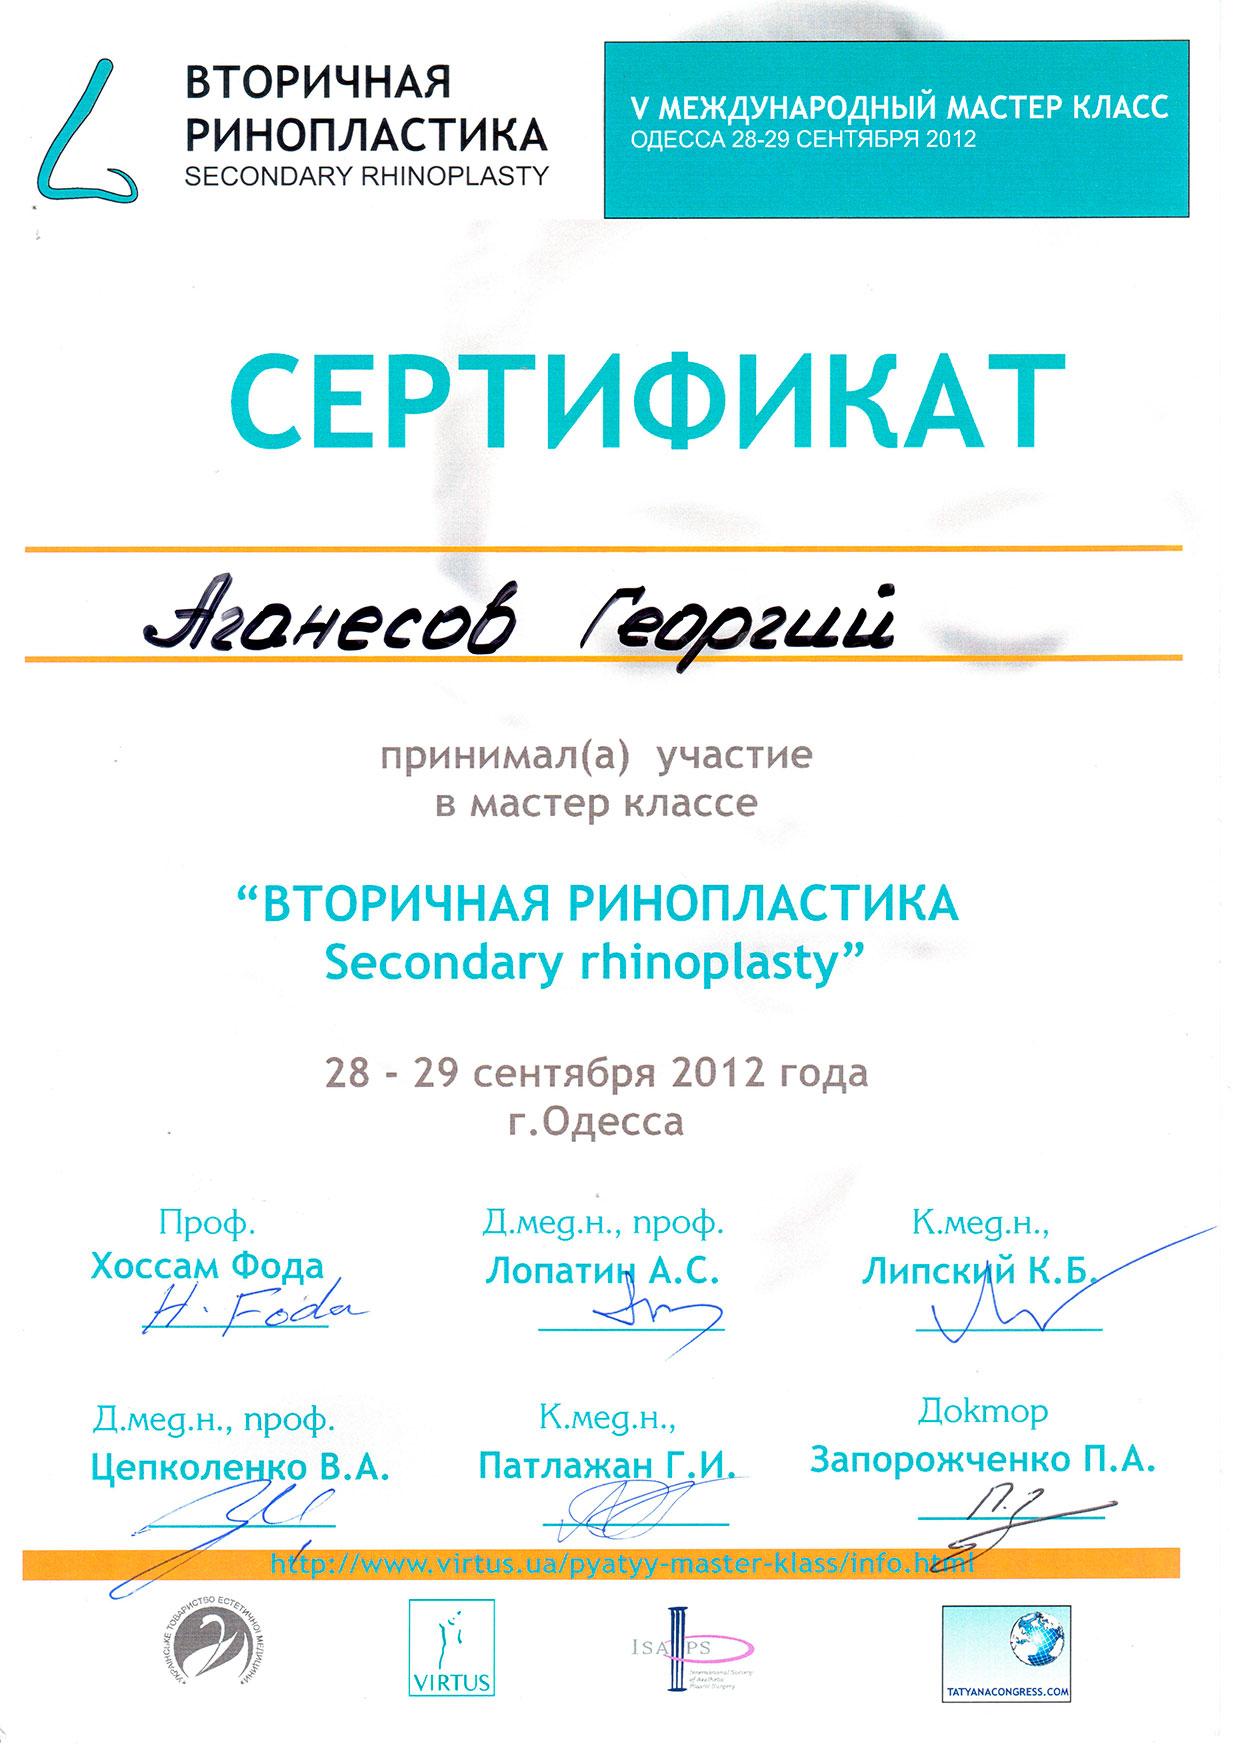 V Международный мастер класс «Вторичная Ринопластика»